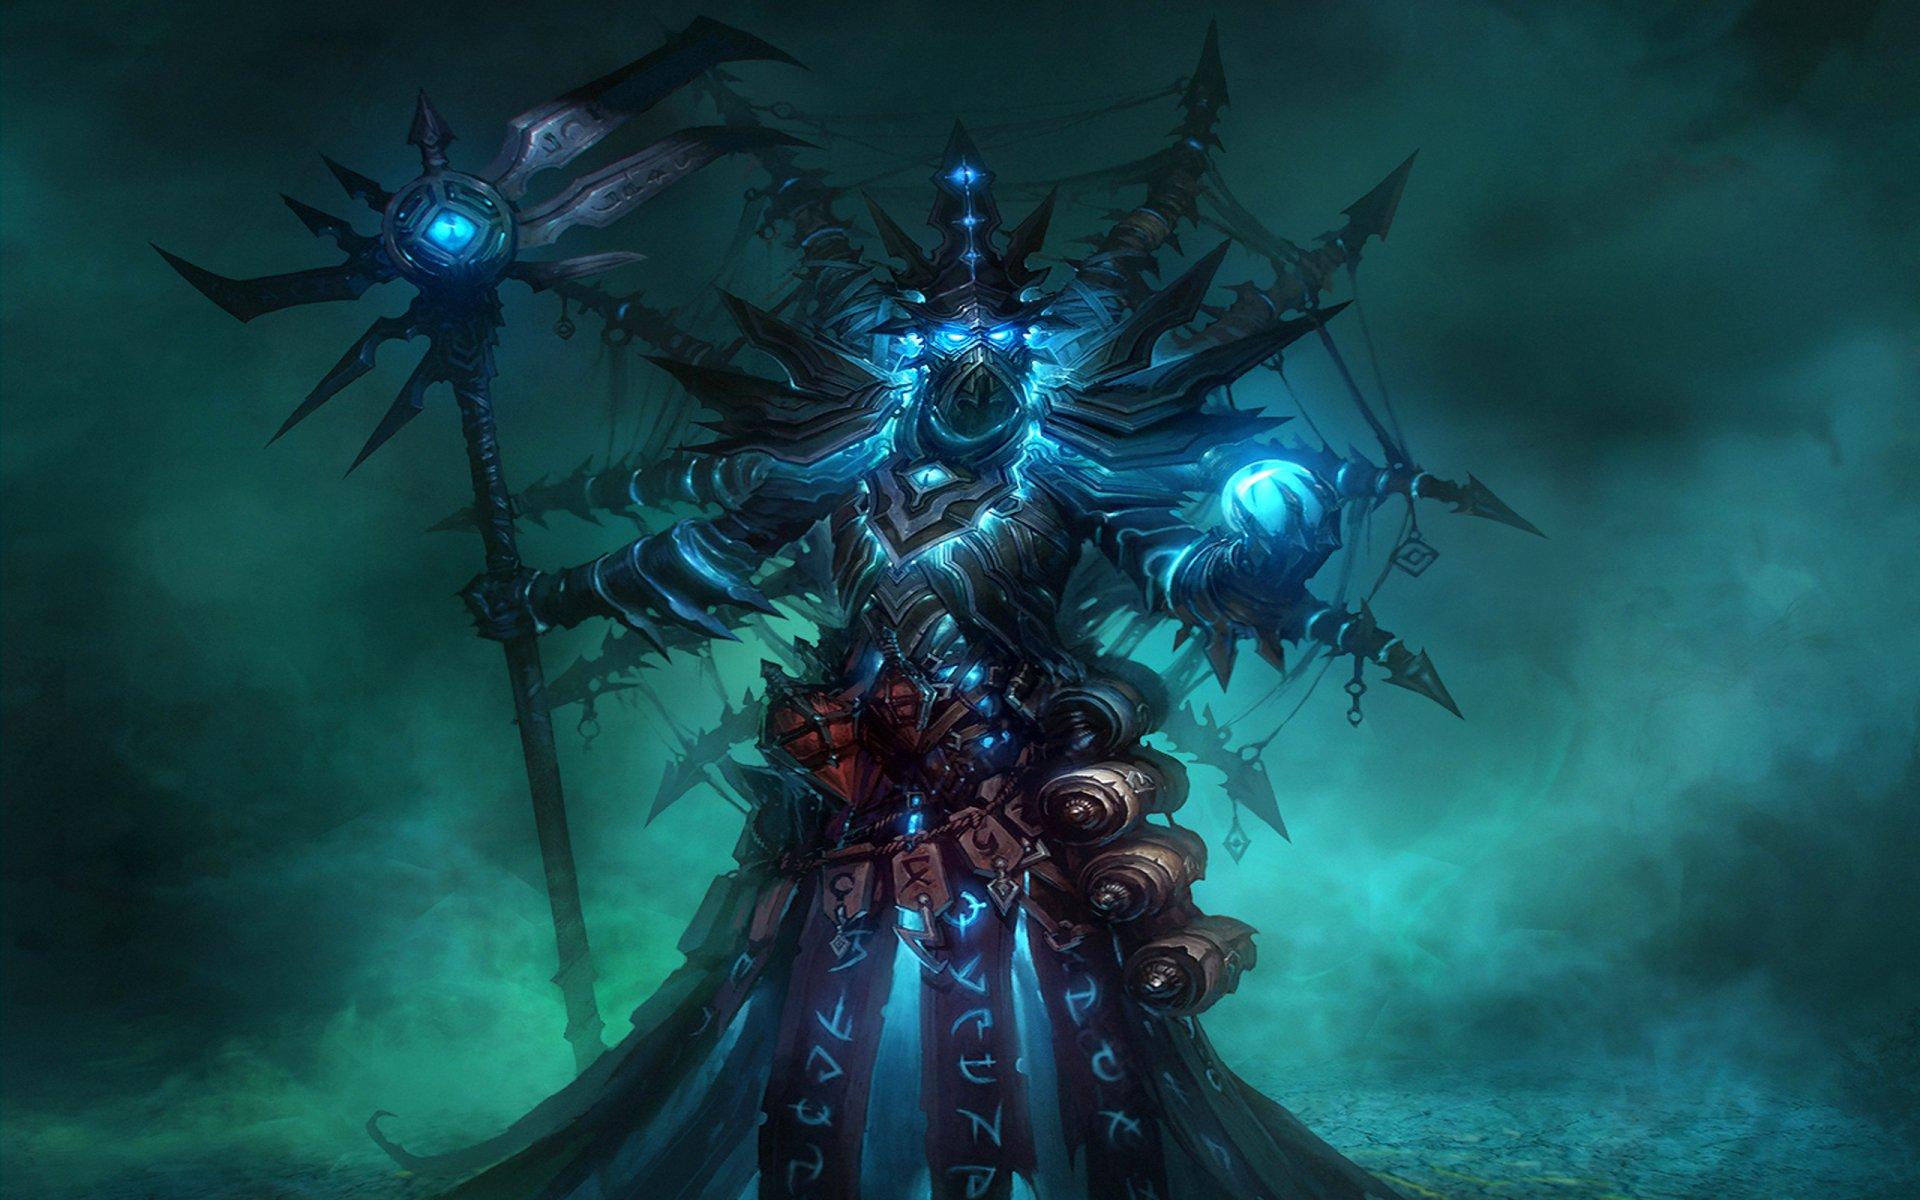 Jeux Vidéo - Warhammer  Fond d'écran